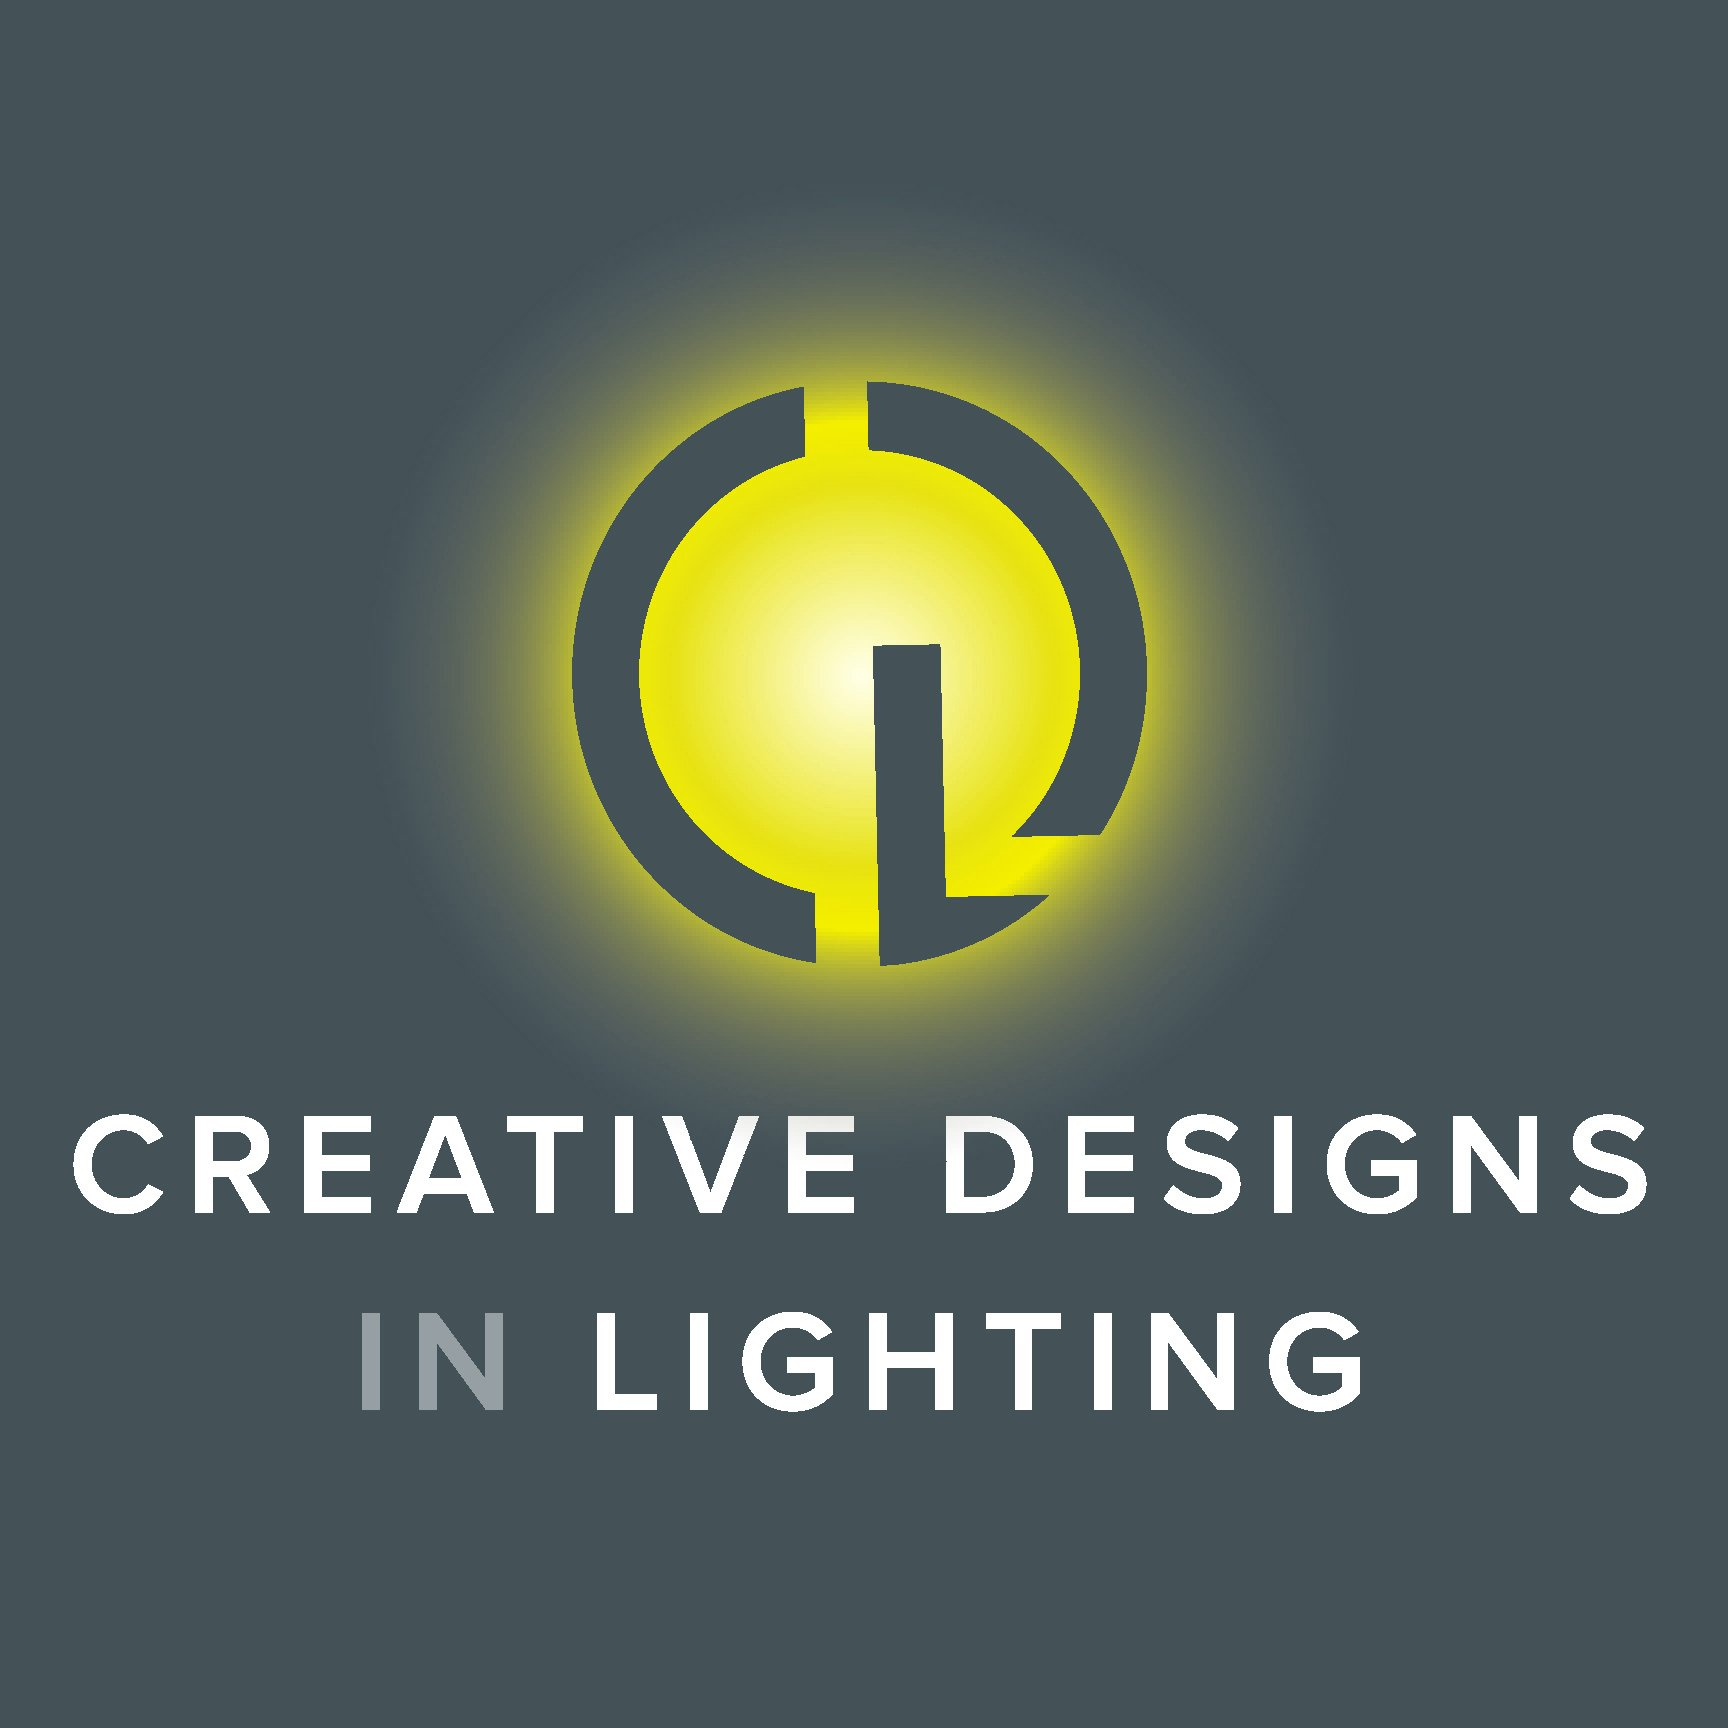 creative designs in lighting. Creative Designs In Lighting R